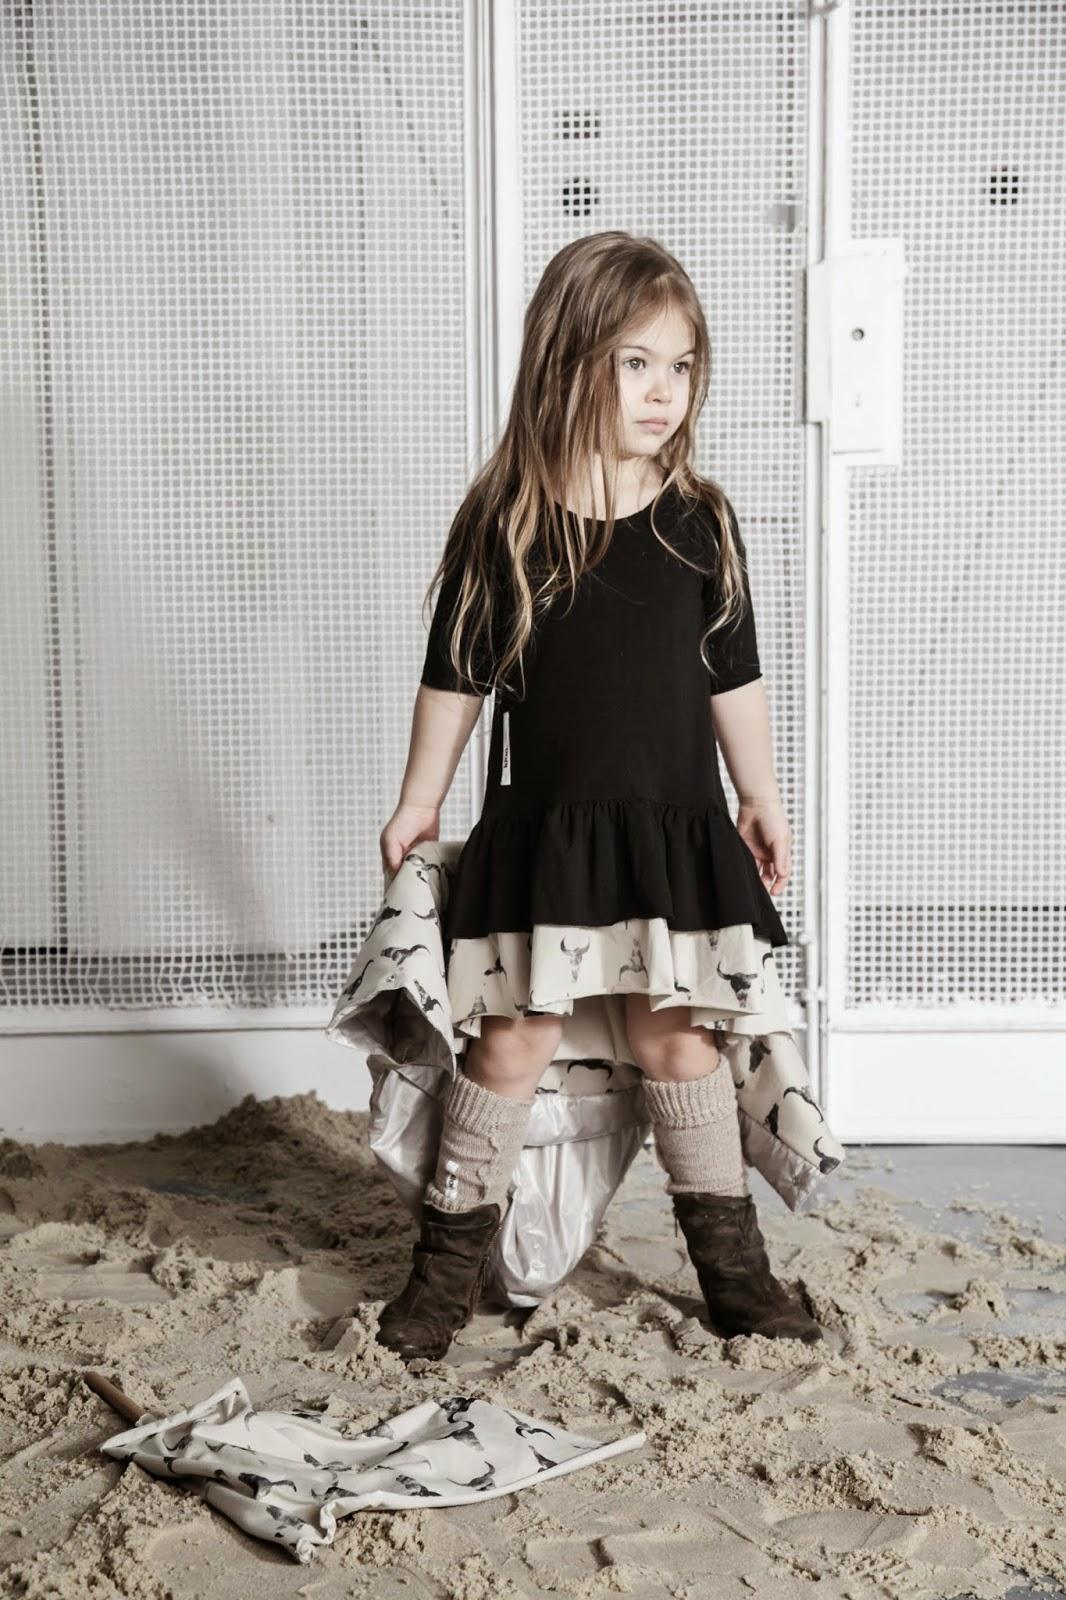 Kloo by Booso - Polish kids fashion spring-summer 2015 - black dress bull's heads